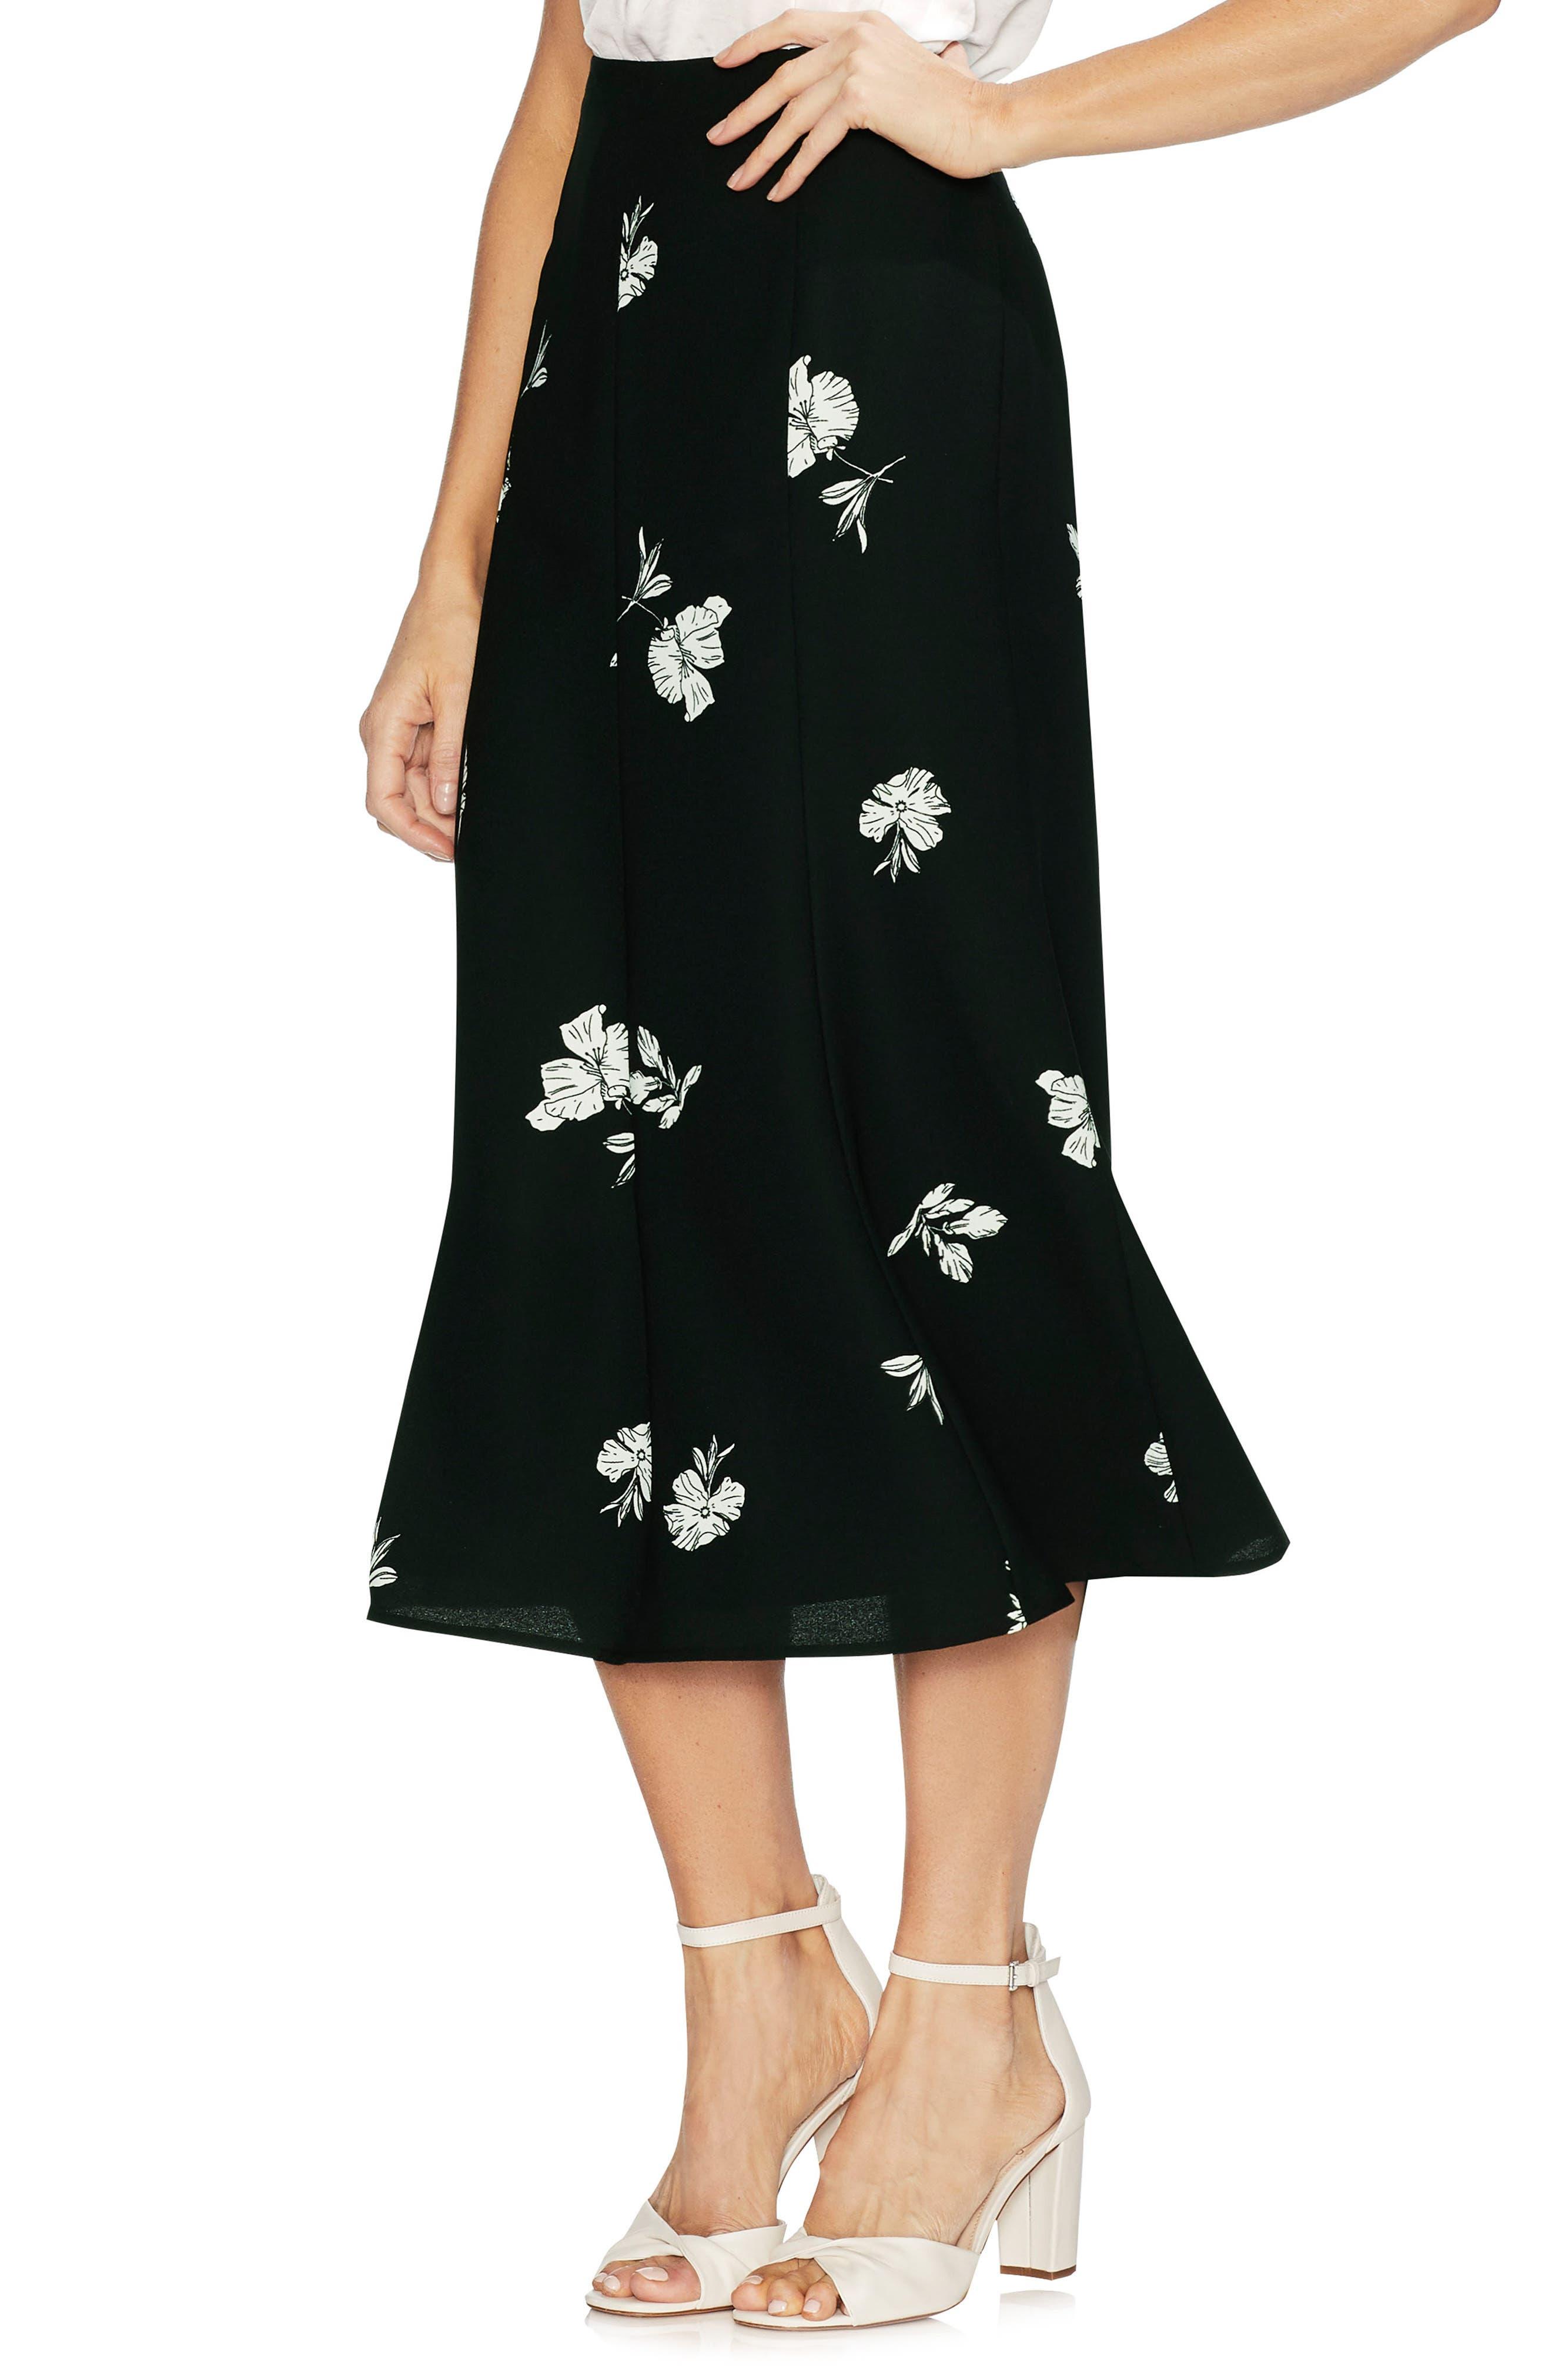 VINCE CAMUTO, Floral Print Skirt, Main thumbnail 1, color, 006